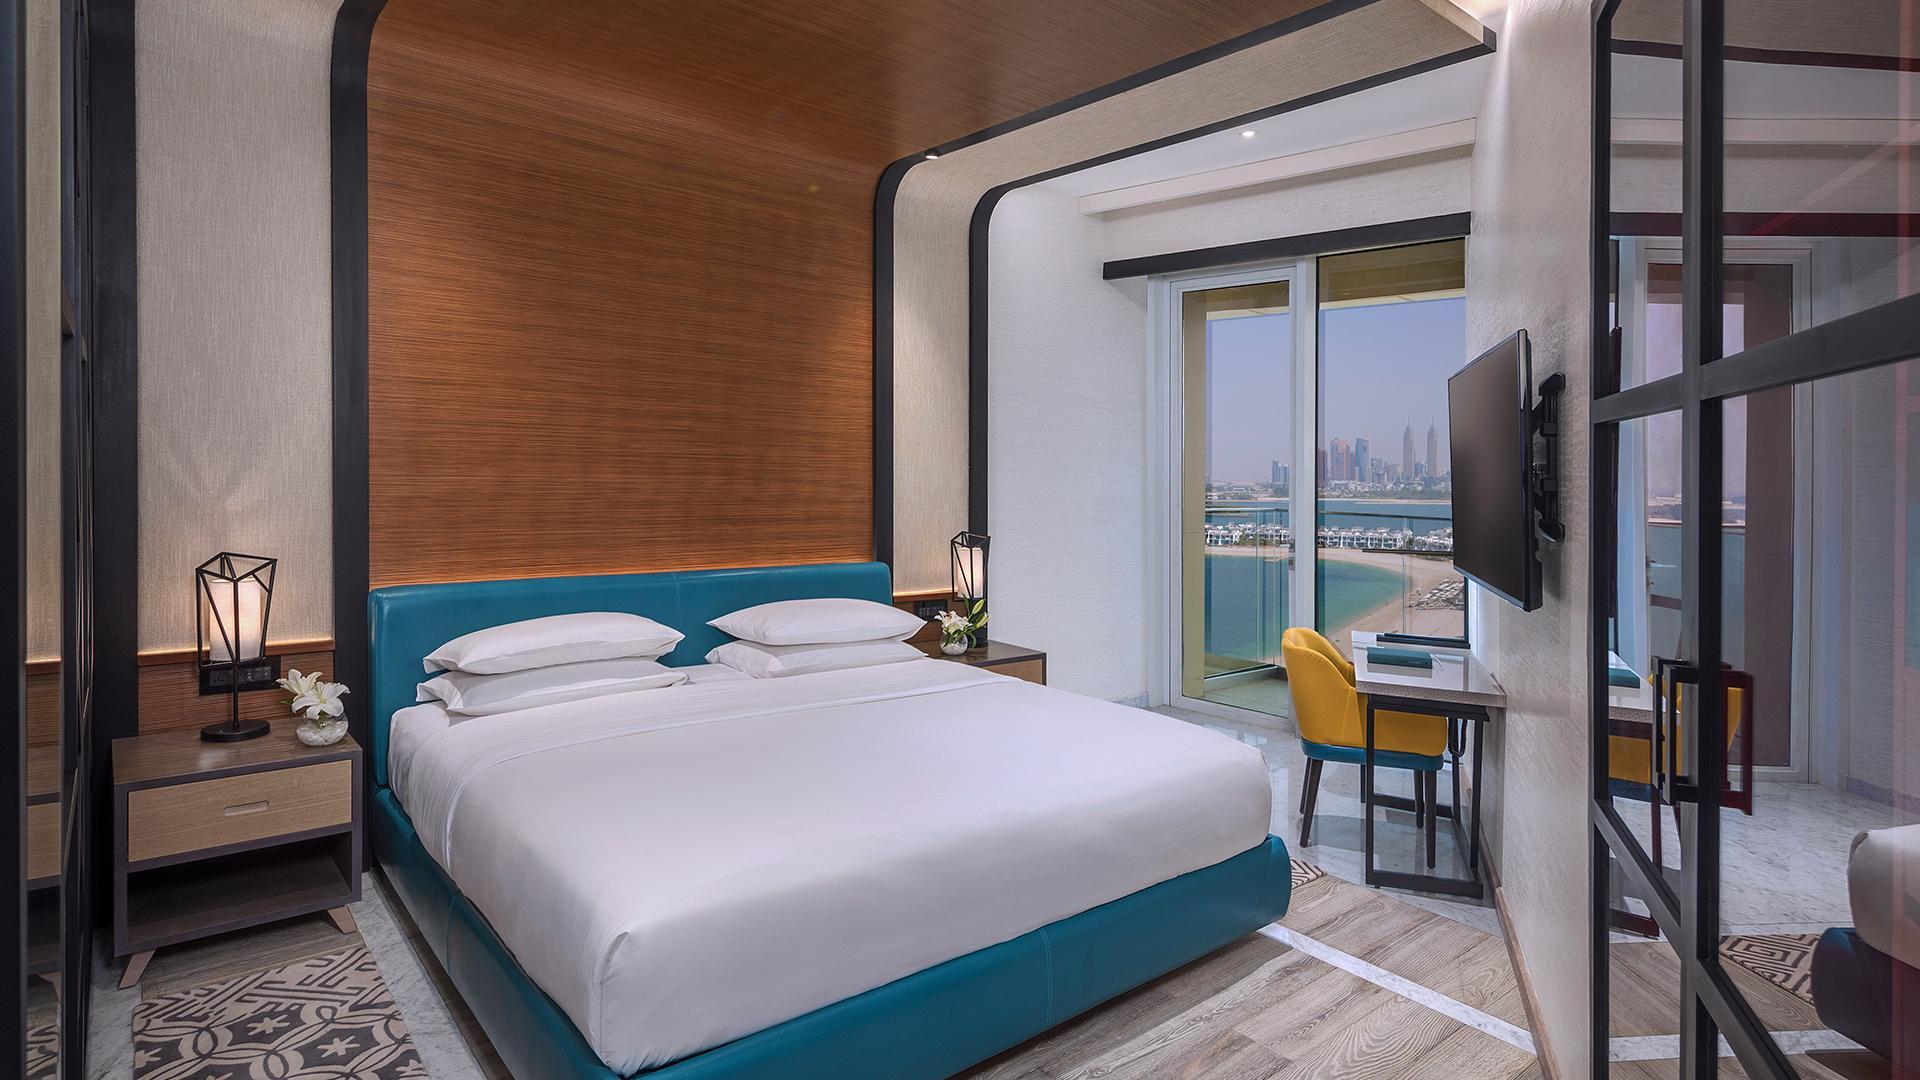 Deluxe Balcony Room image 1 at Andaz Dubai The Palm by null, Dubai, United Arab Emirates